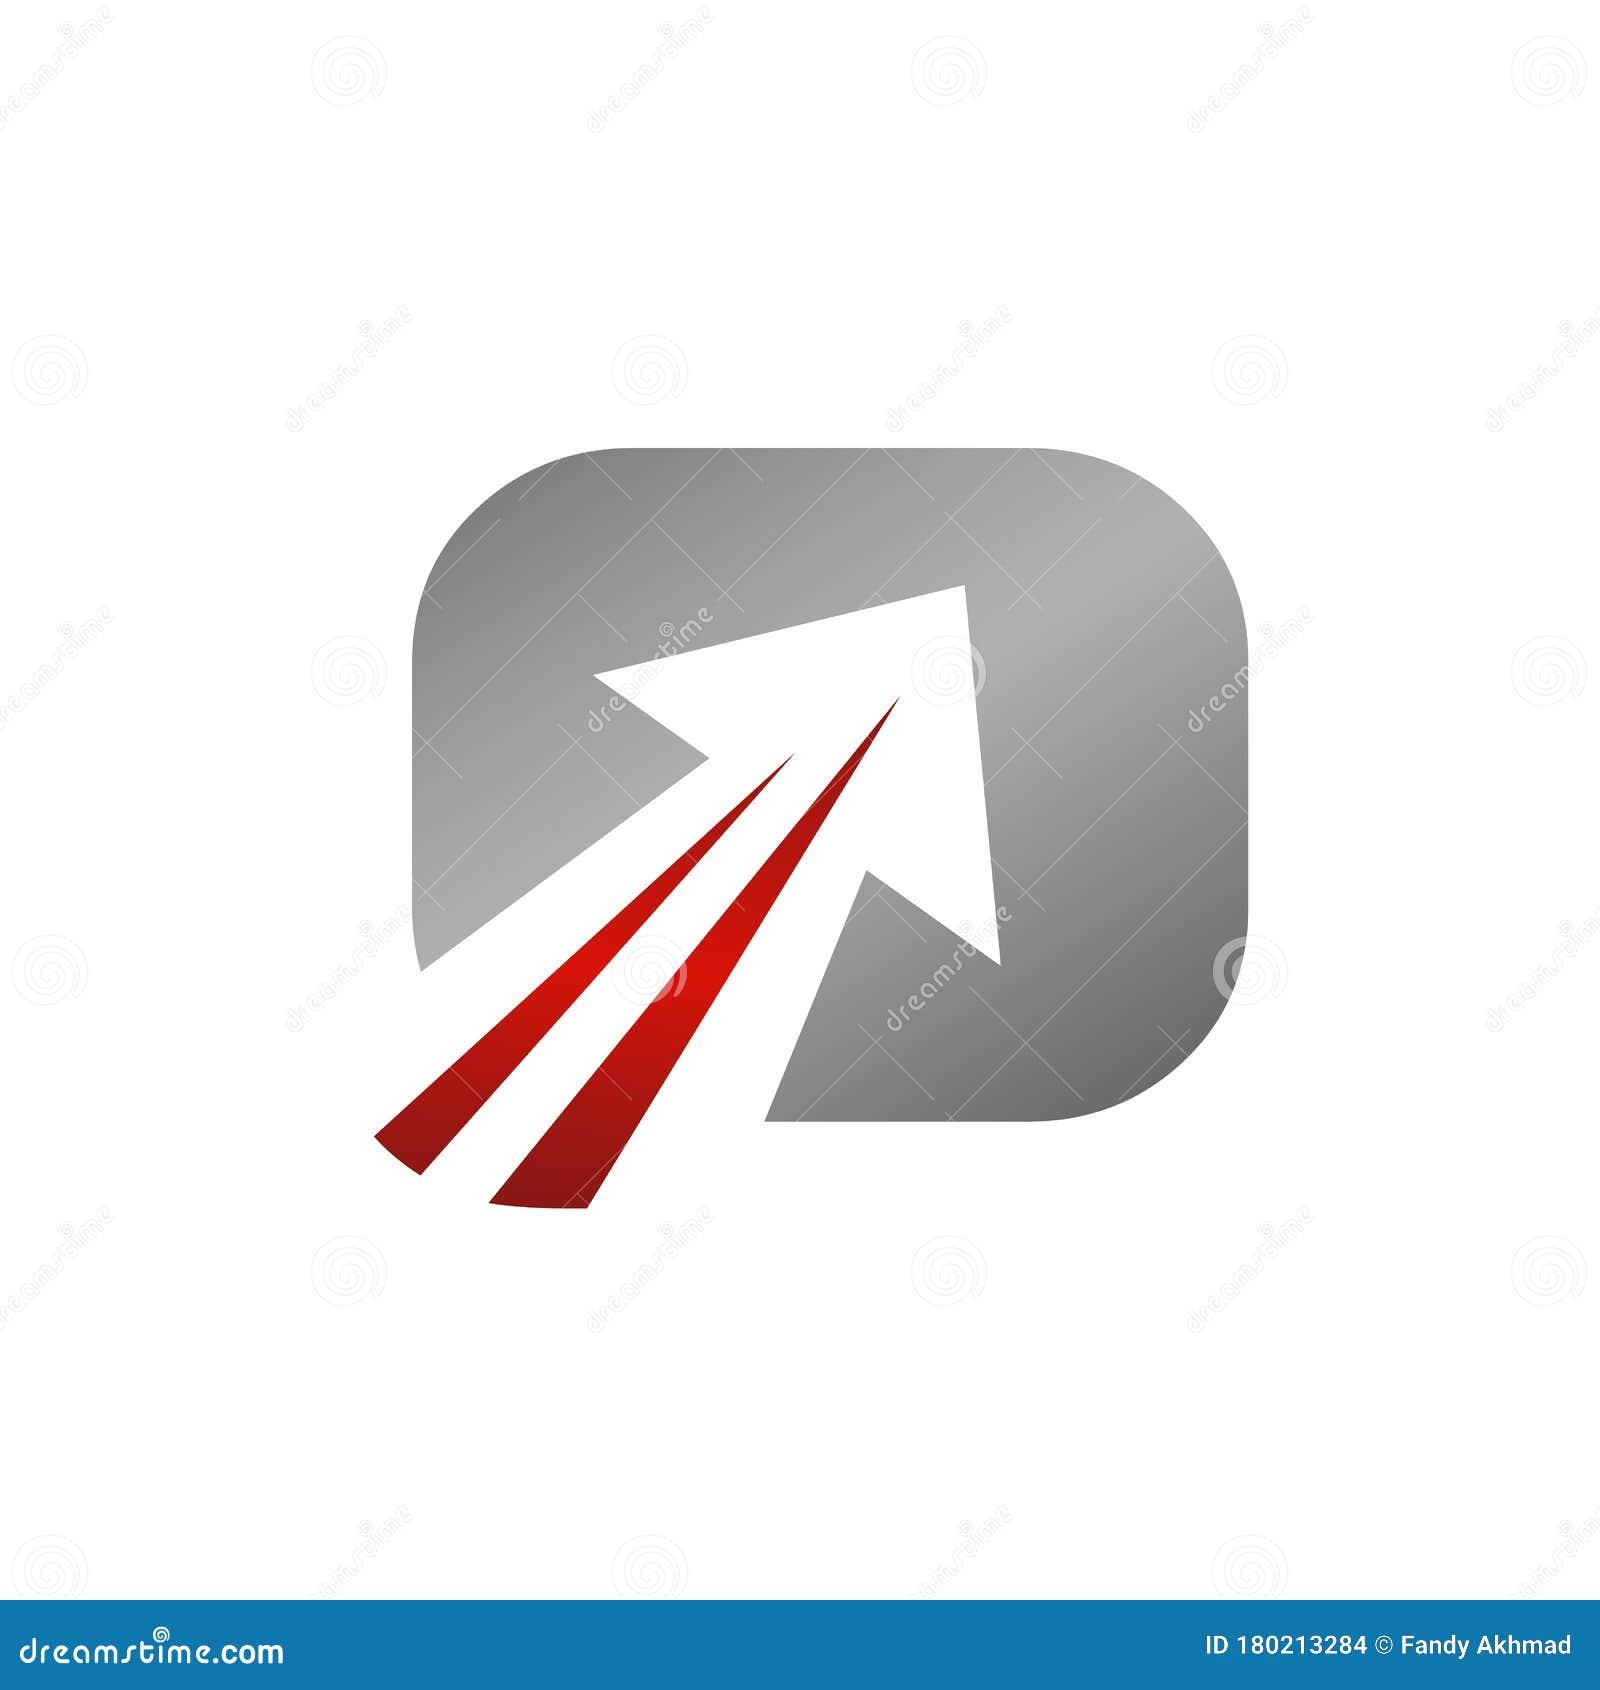 Abstract Square Arrow Logo Vector Icon Symbol Illustration